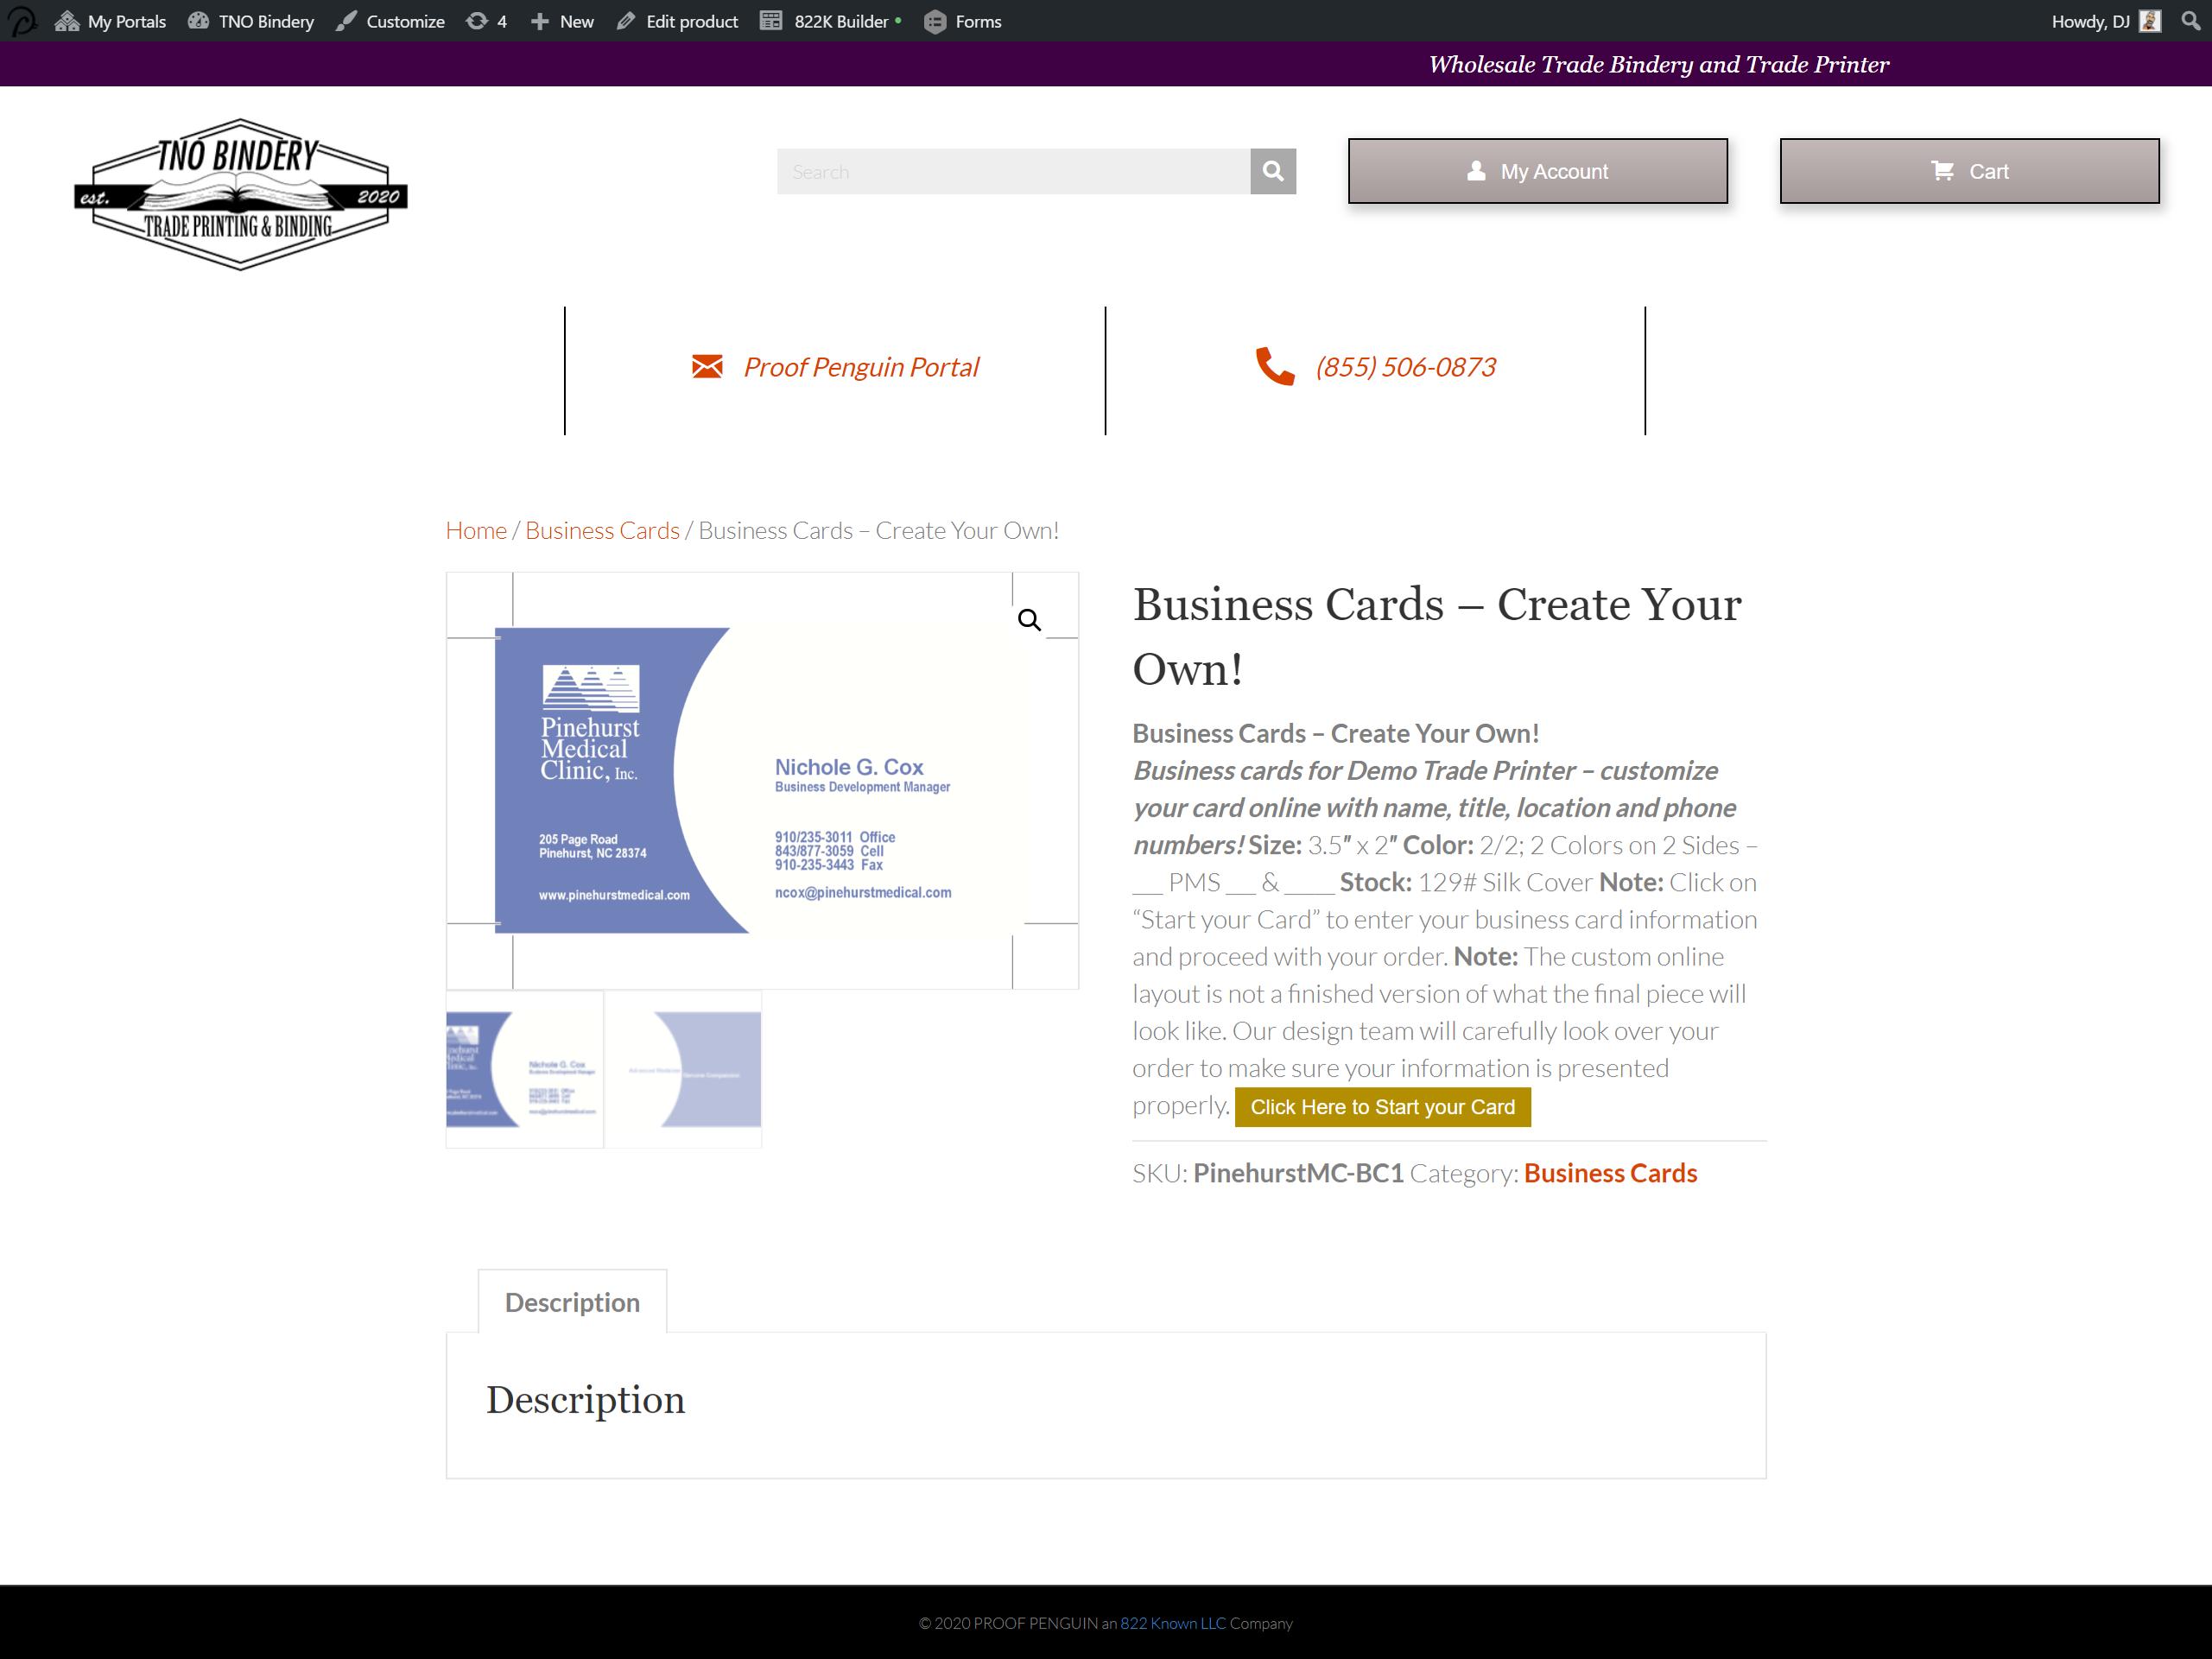 Printer-customer-inventory-order-system-demo-business-card